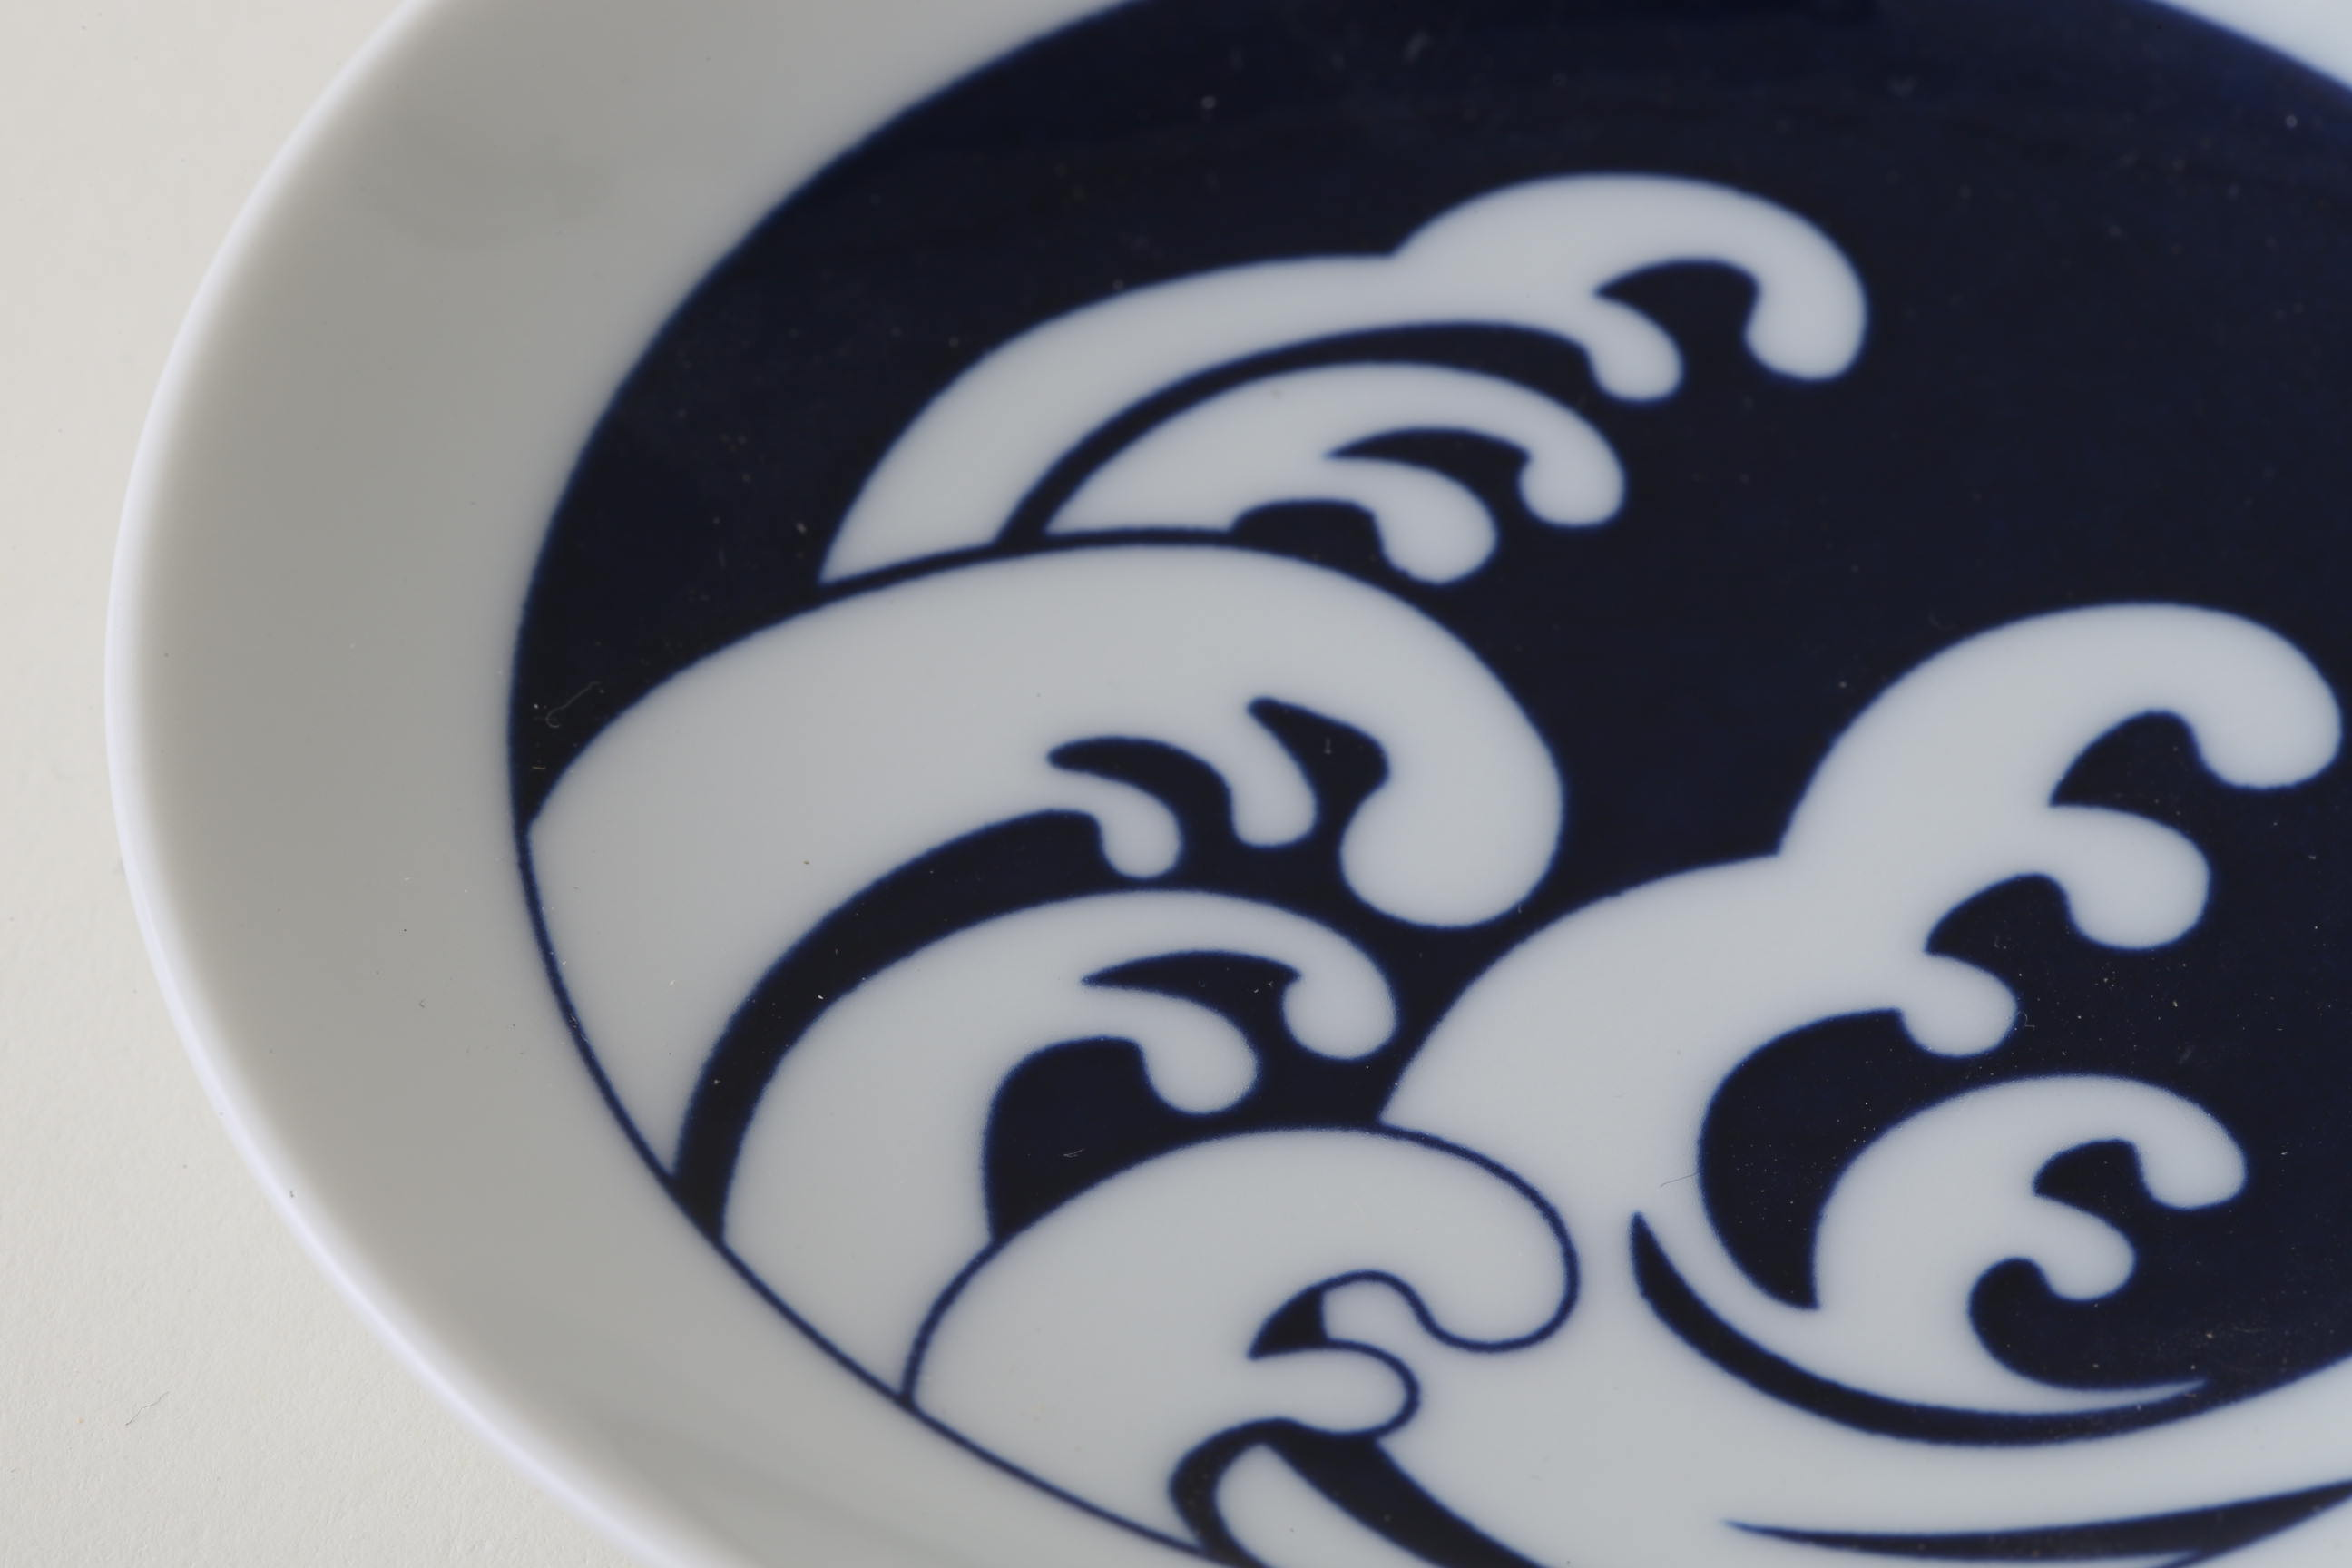 KIHARA/Mamezara 5種セット(季節)